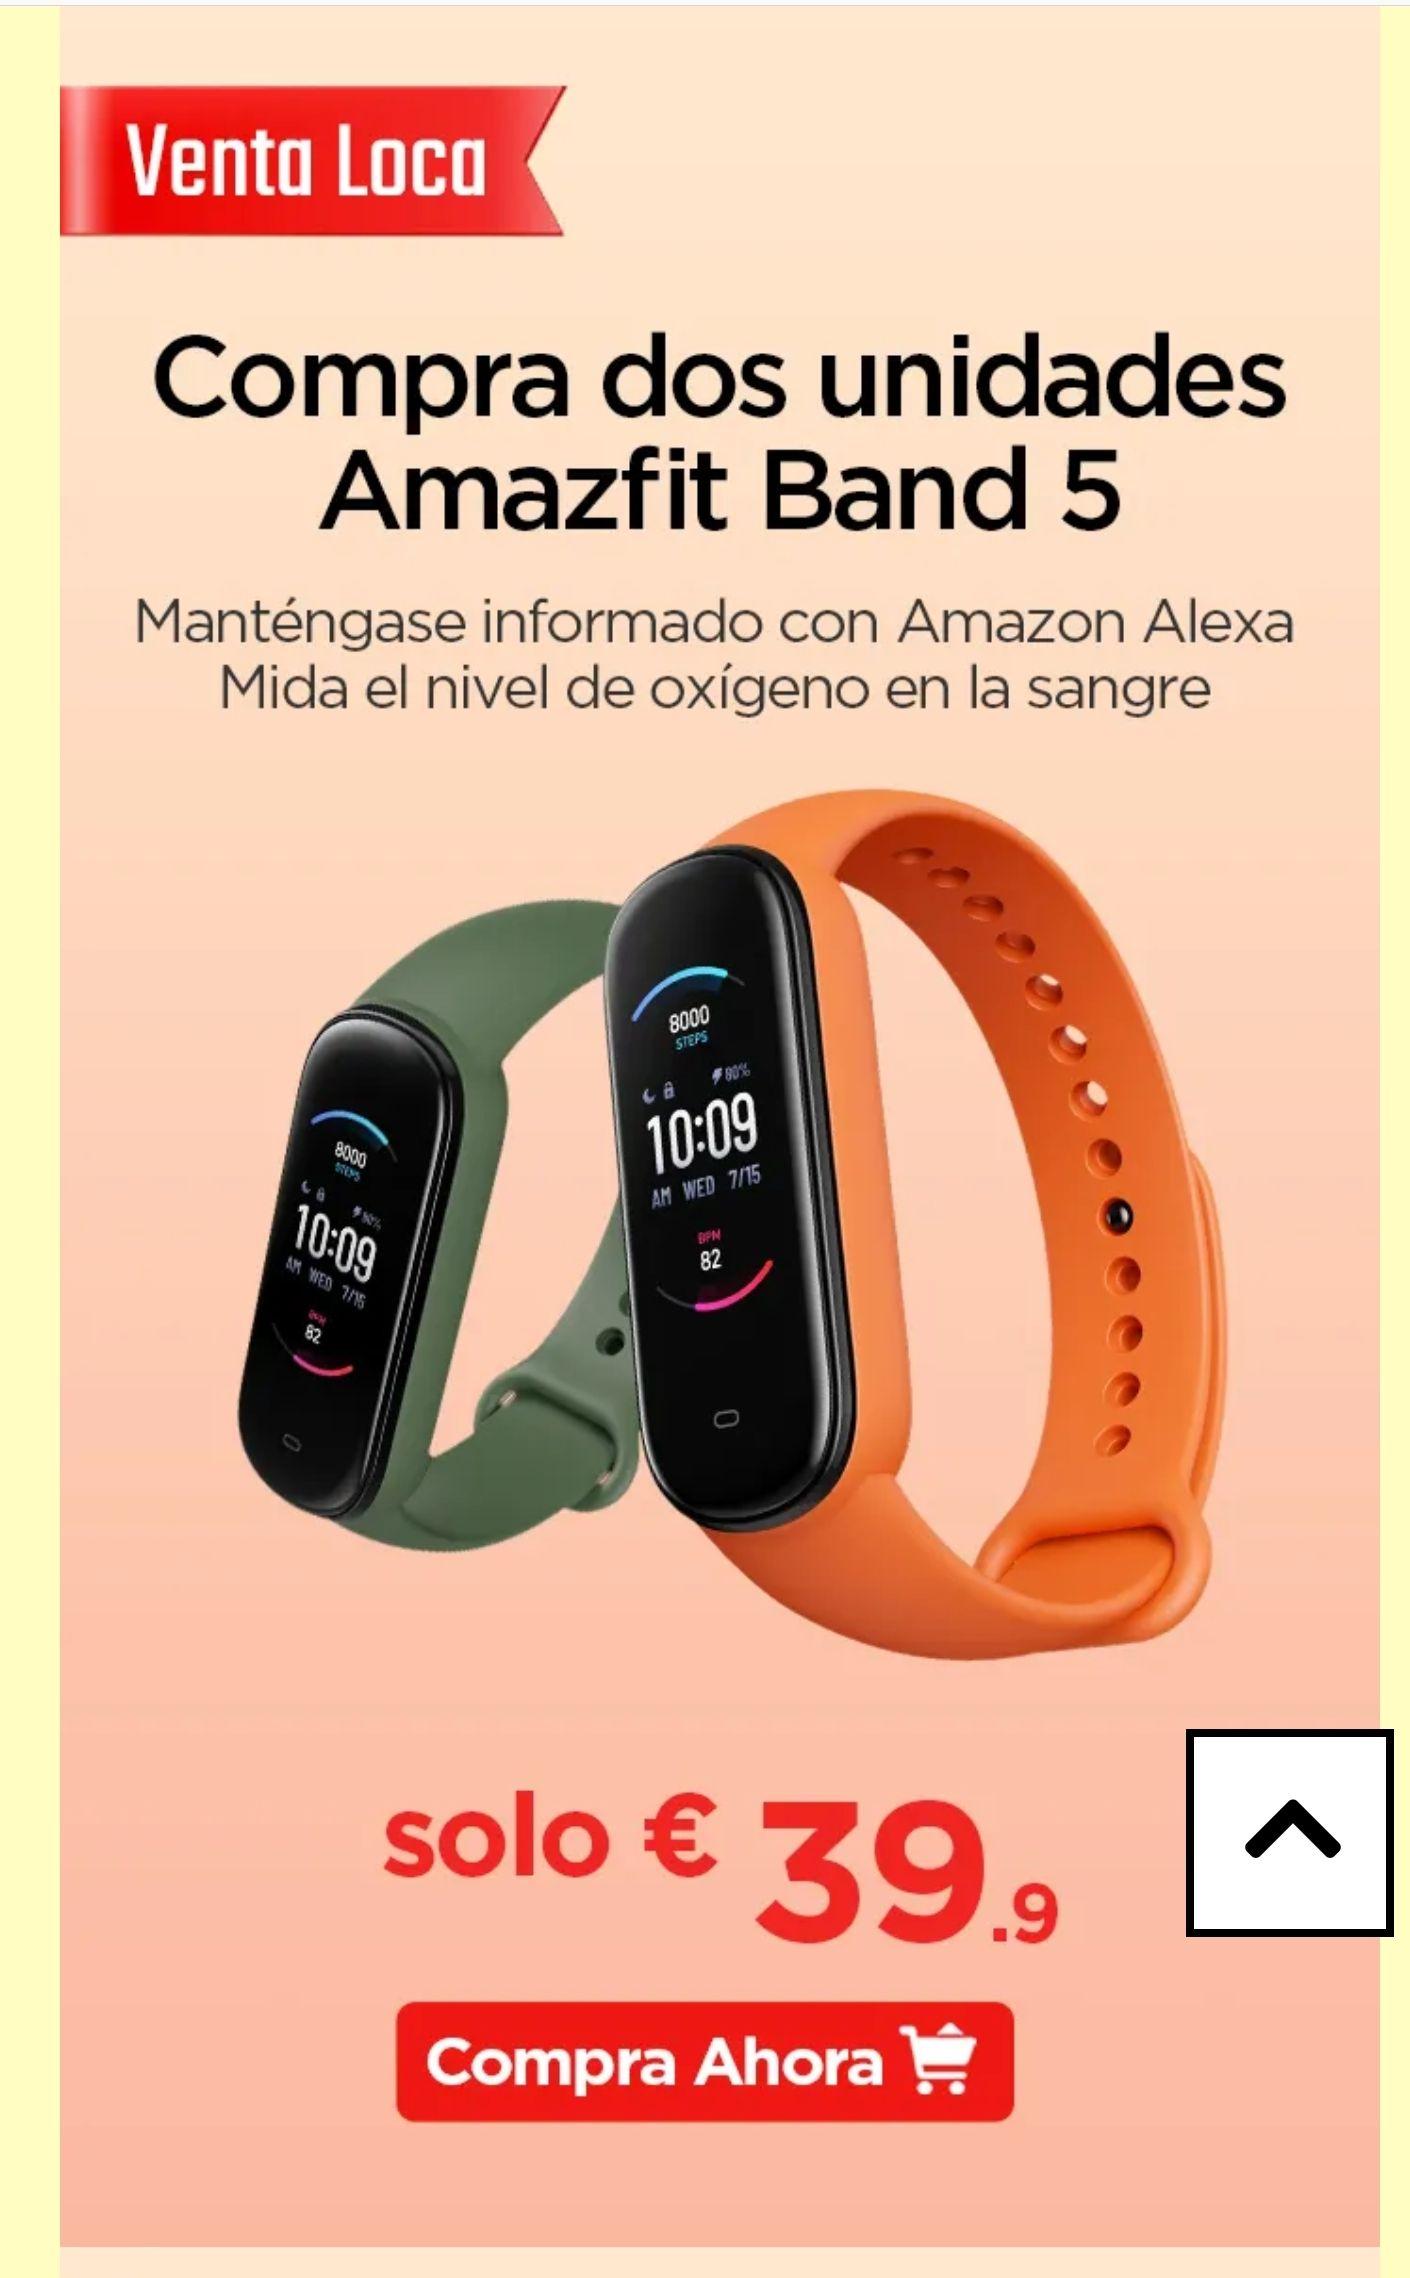 Dos unidades Amazfit Band 5, solo 39,9€